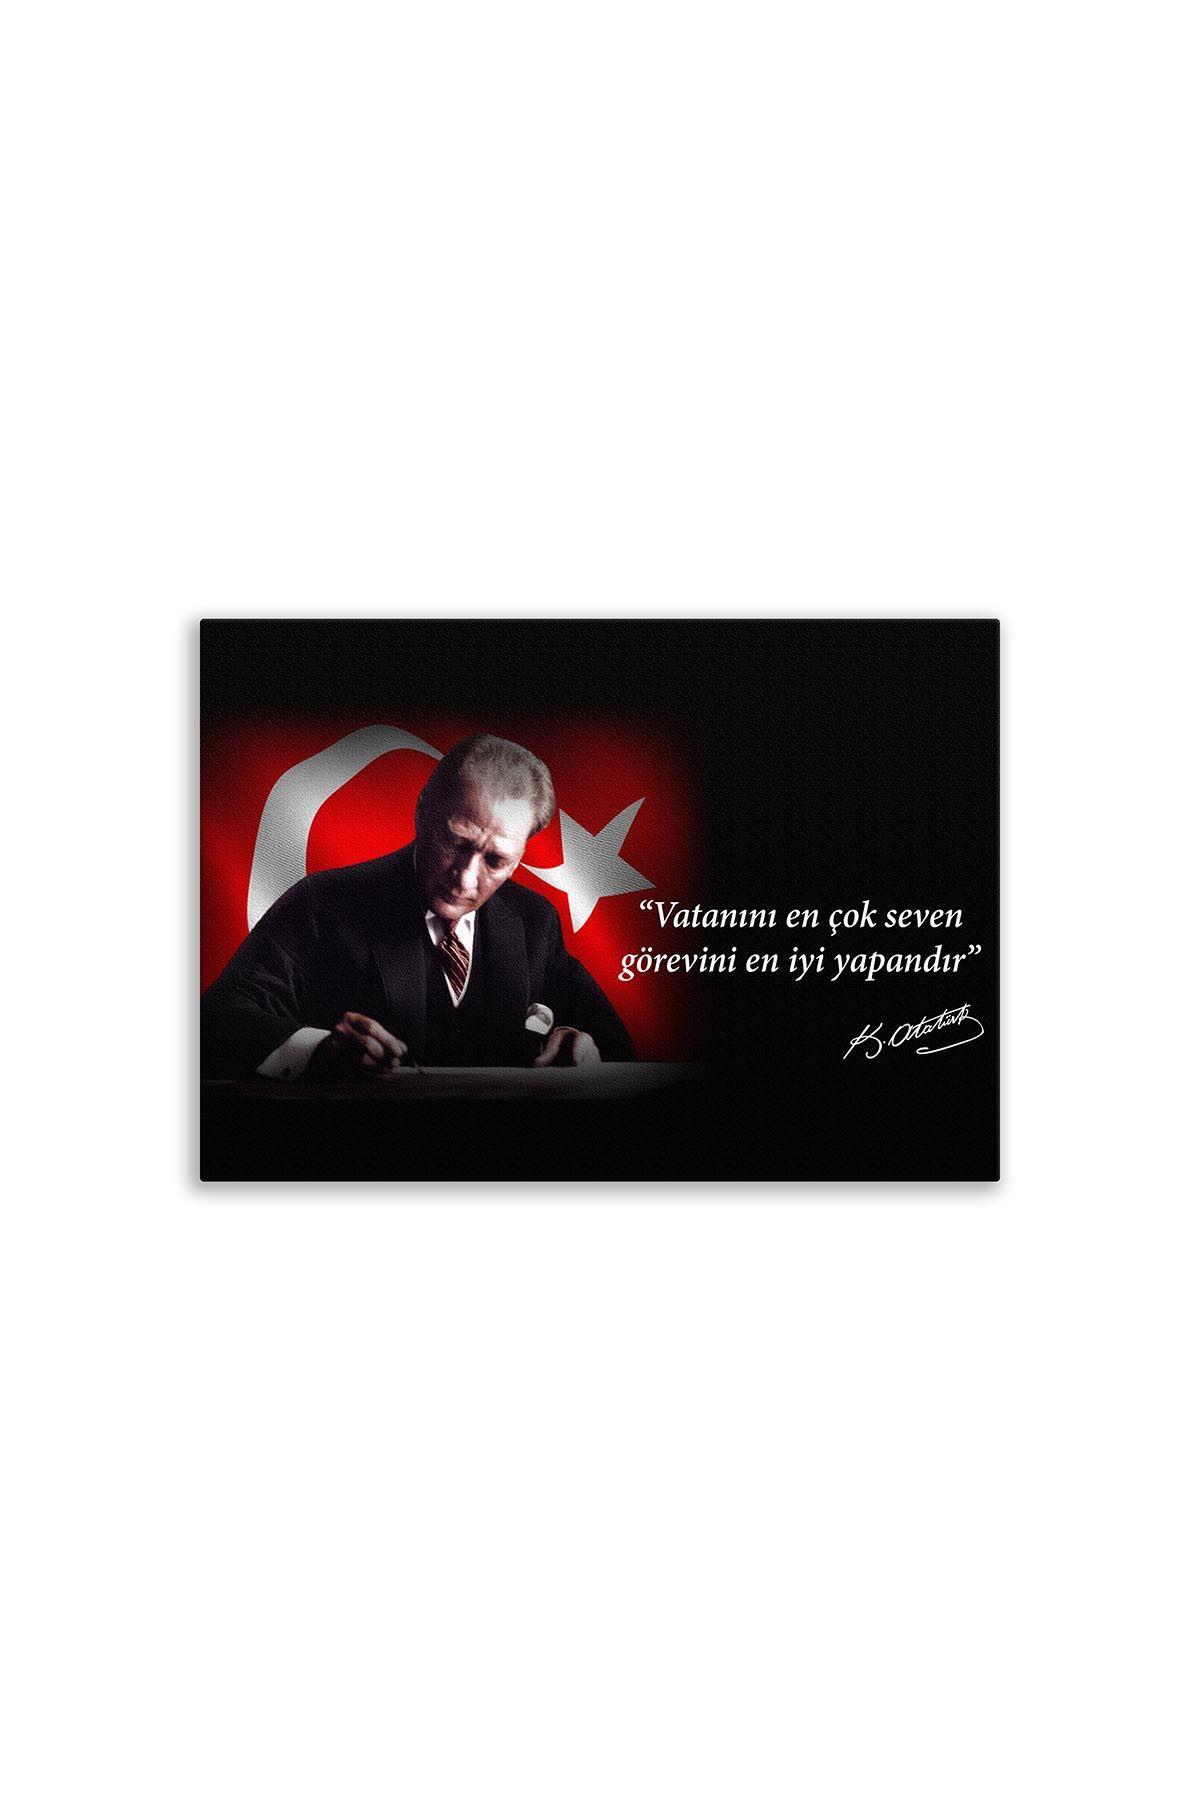 Founder of Turkiye Ataturk Canvas Board | Printed Canvas Board | Customized Canvas Board |Digital Printing